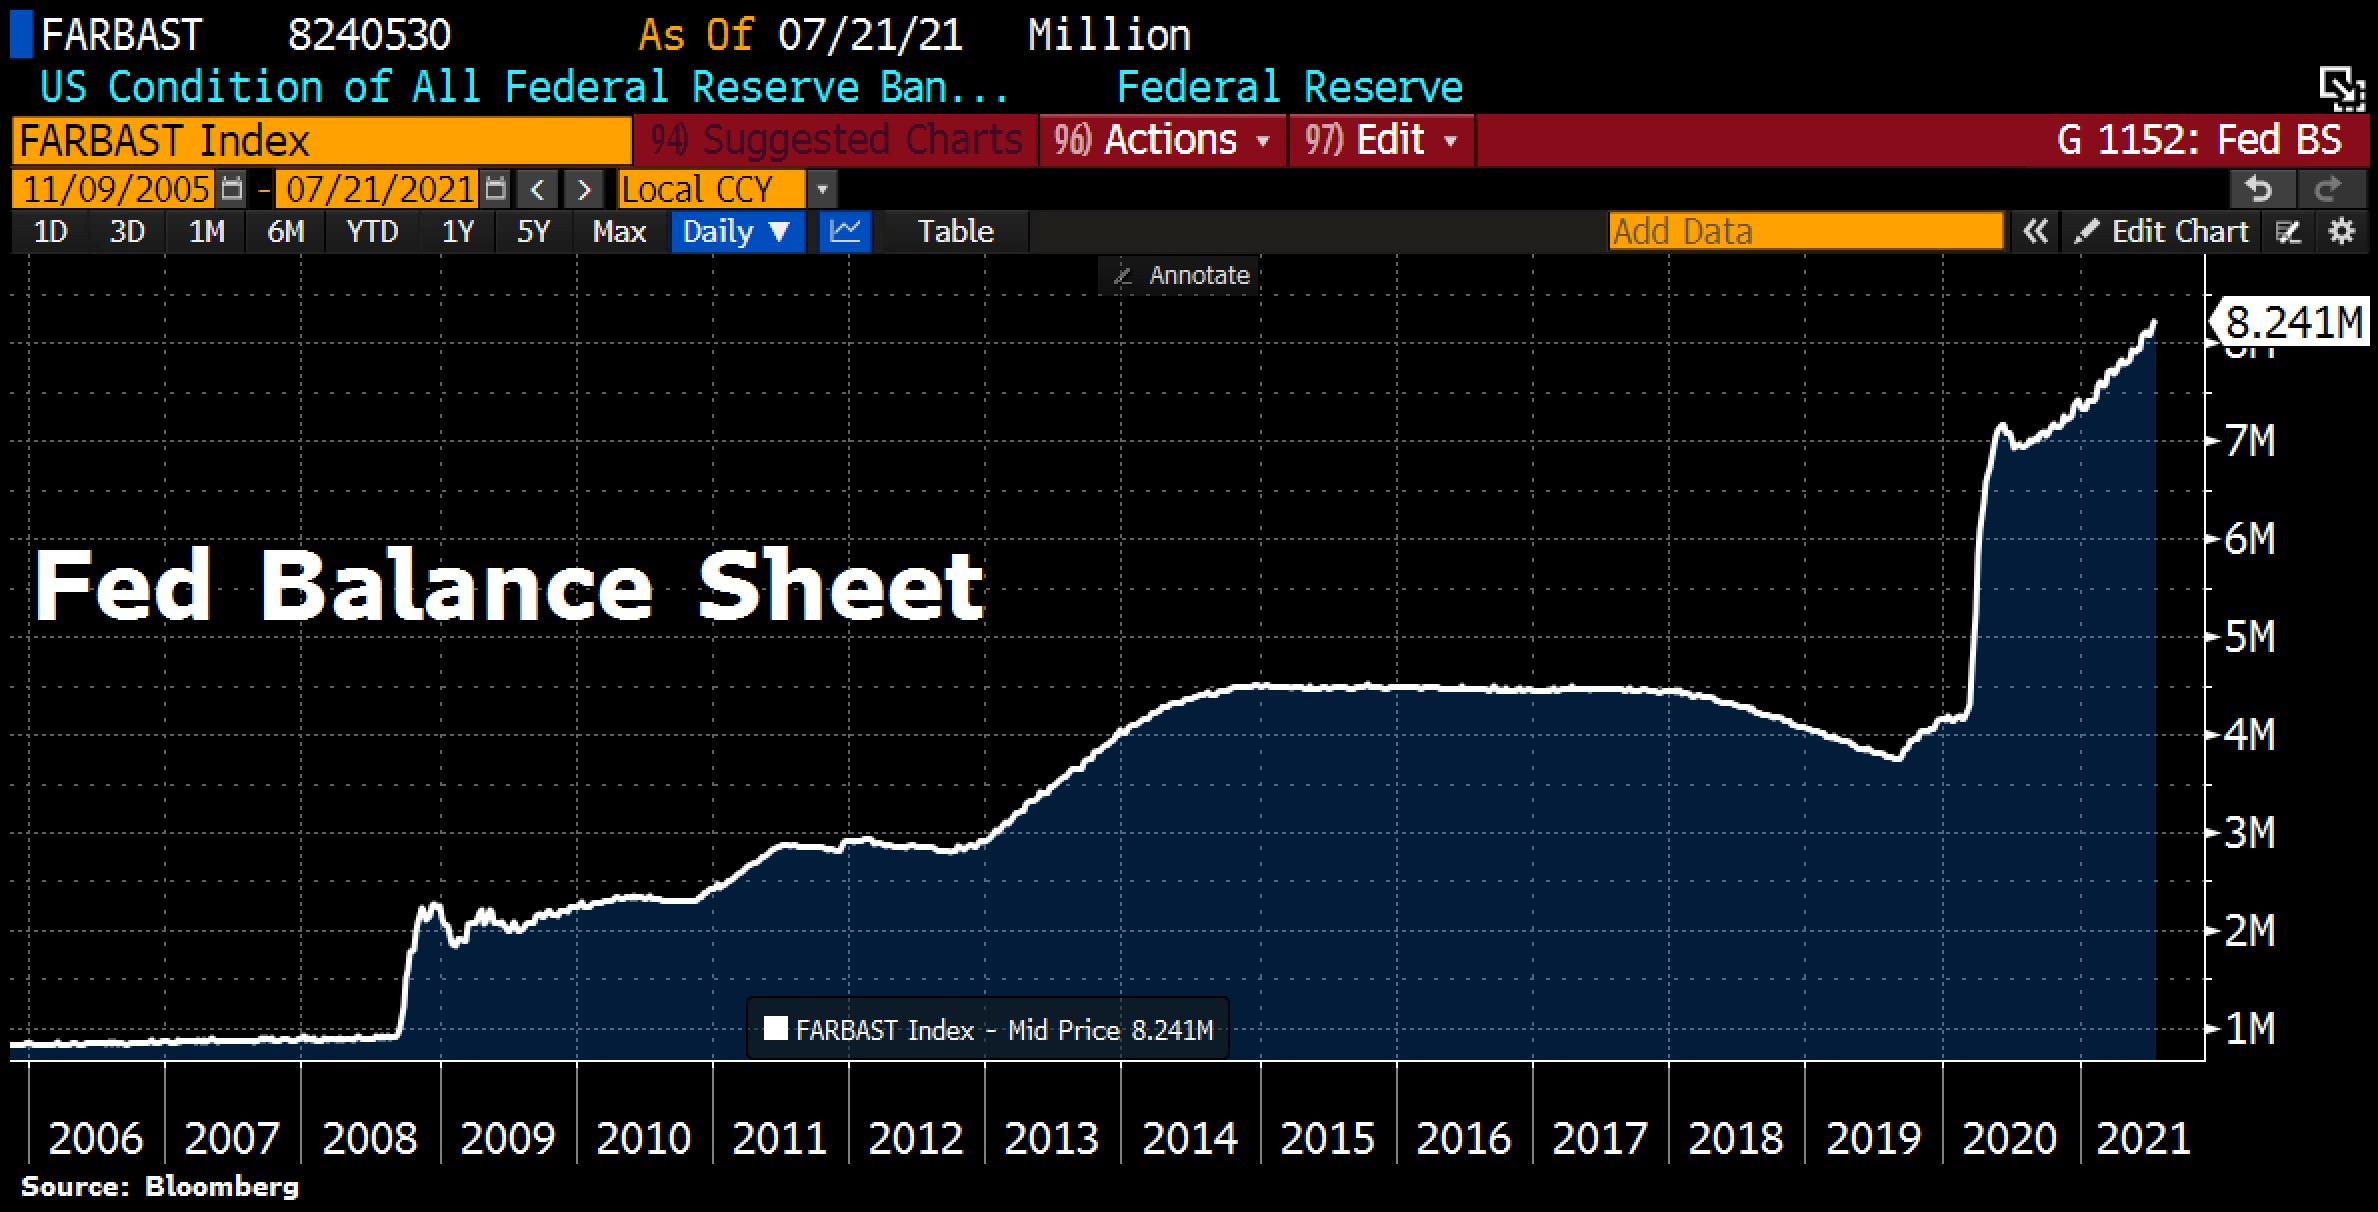 FED balance sheet as o July 21st, 2021.